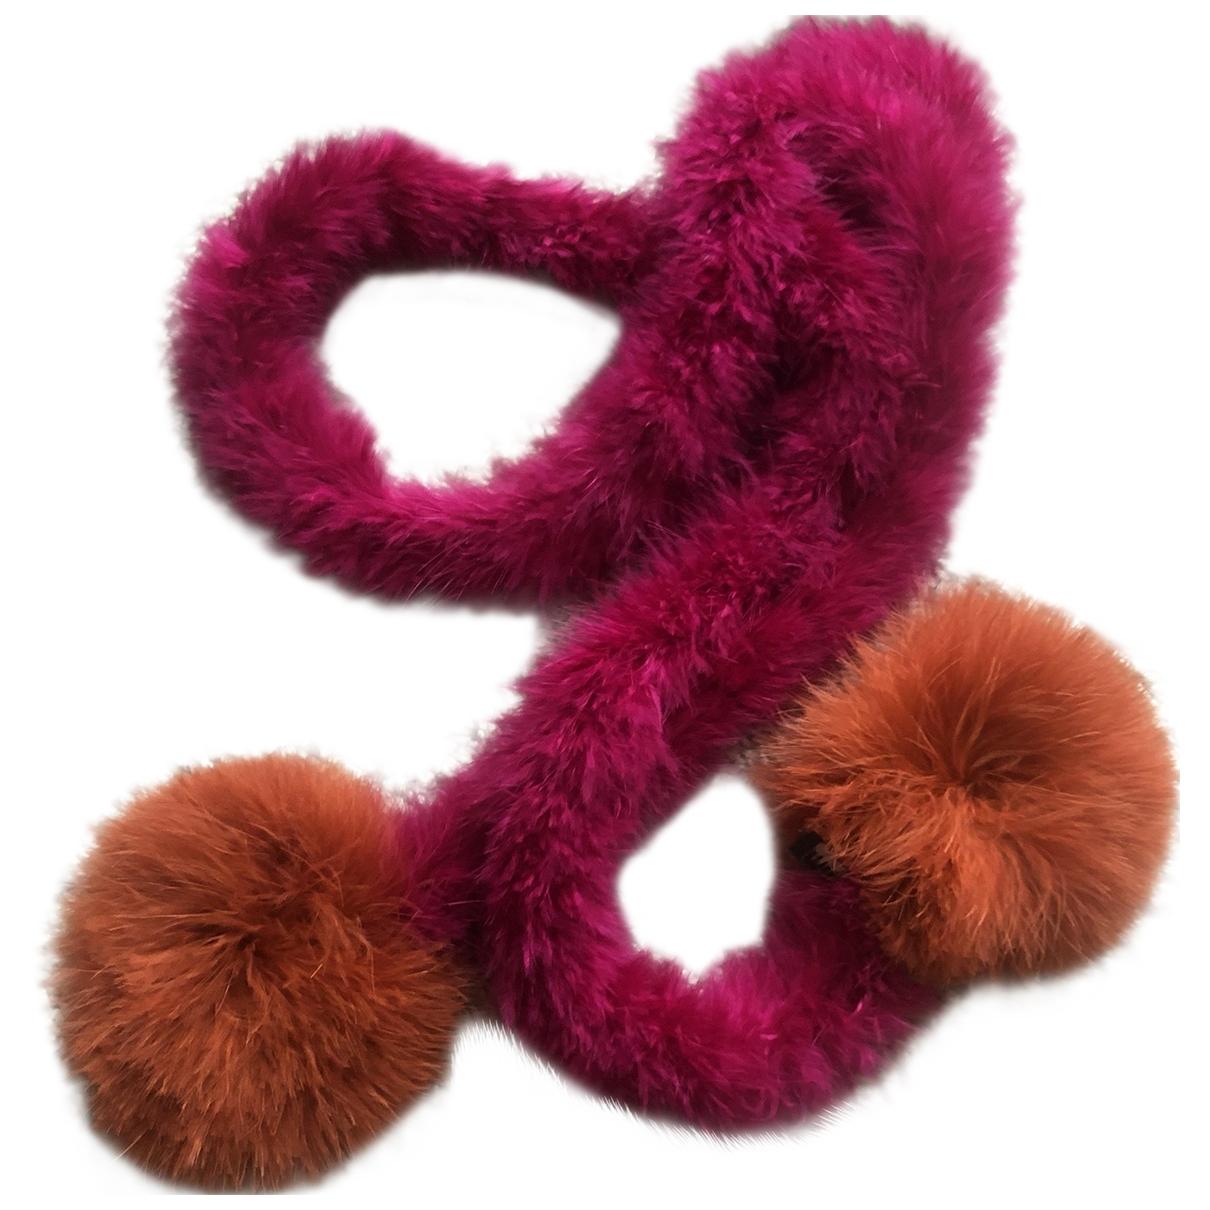 Miu Miu - Foulard   pour femme en fourrure - multicolore